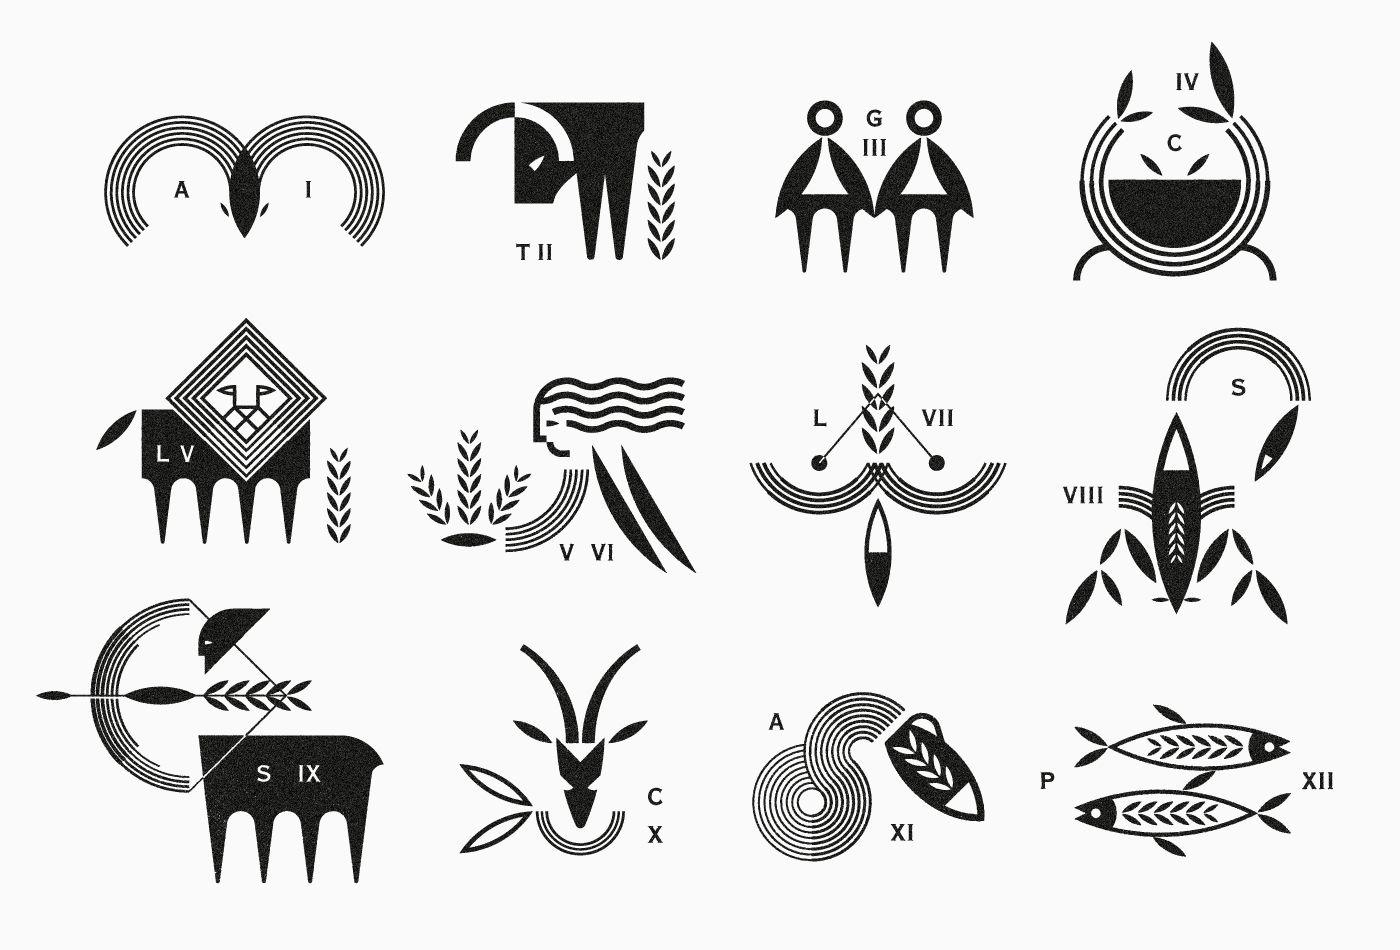 Logo Logos Marks Vacaliebres Zodiac Greek Symbolslogomarks A